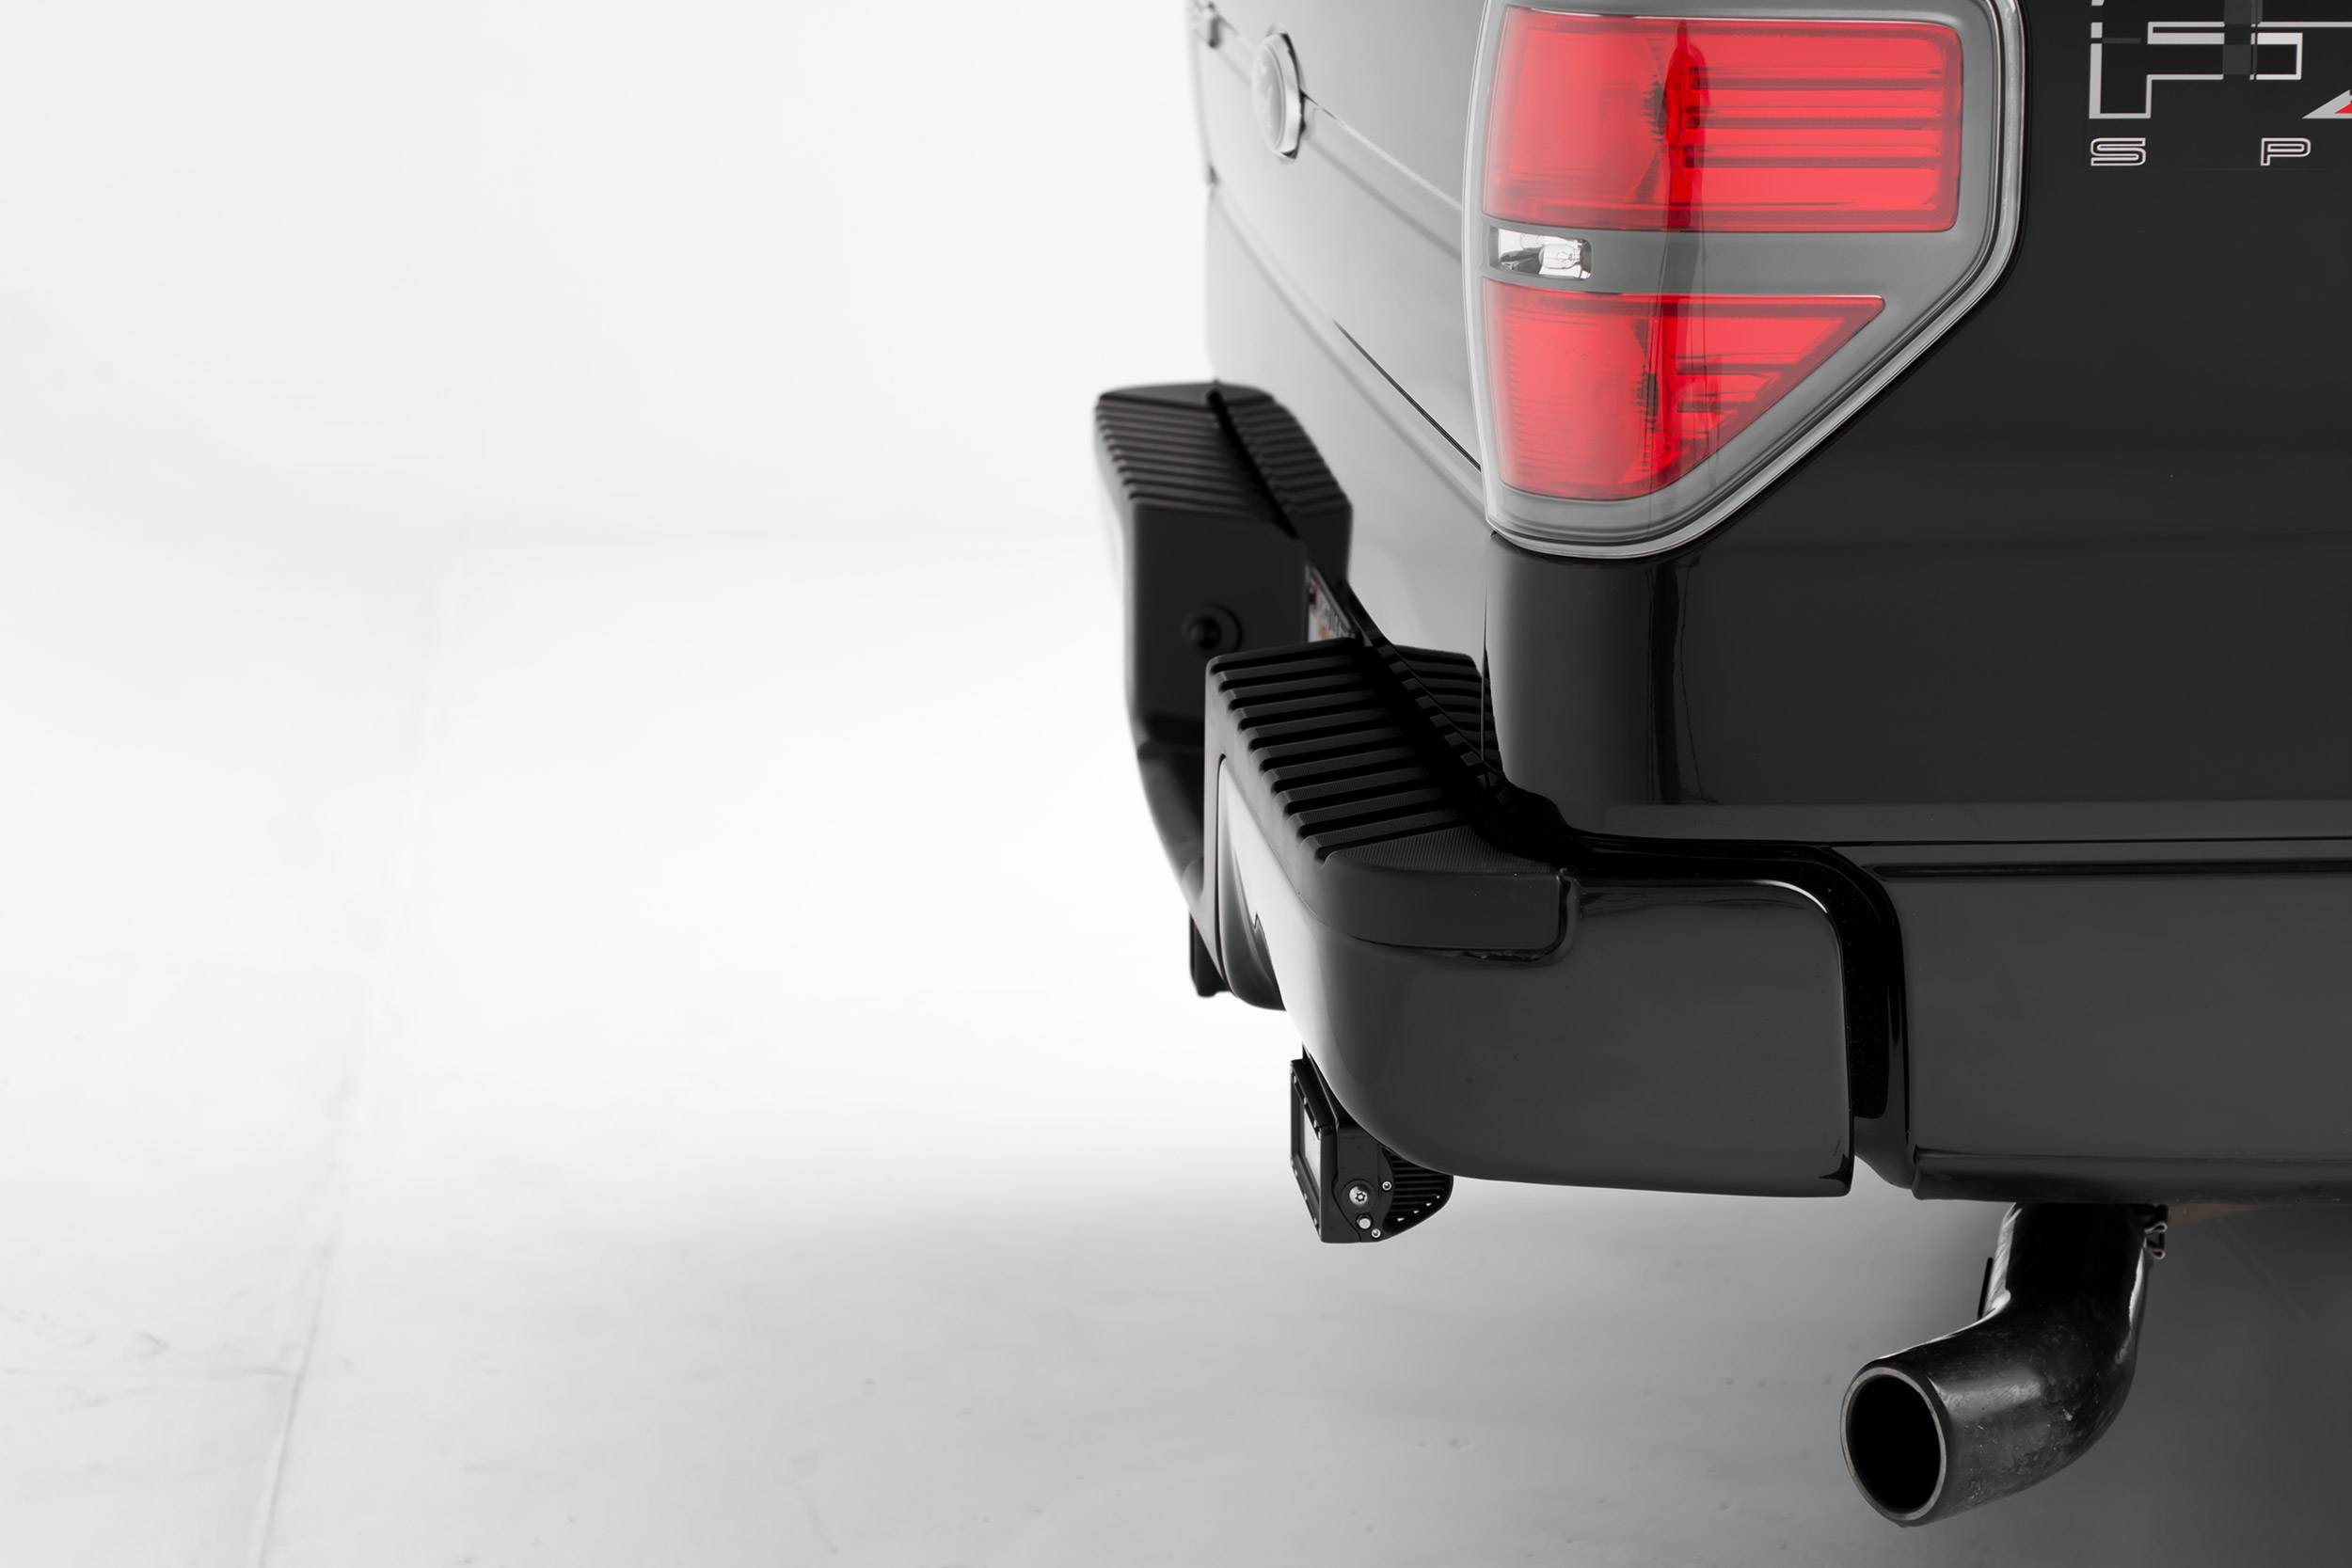 ZROADZ - 2009-2014 Ford F-150 Rear Bumper LED Kit with (2) 6 Inch LED Straight Double Row Light Bars - PN #Z385721-KIT